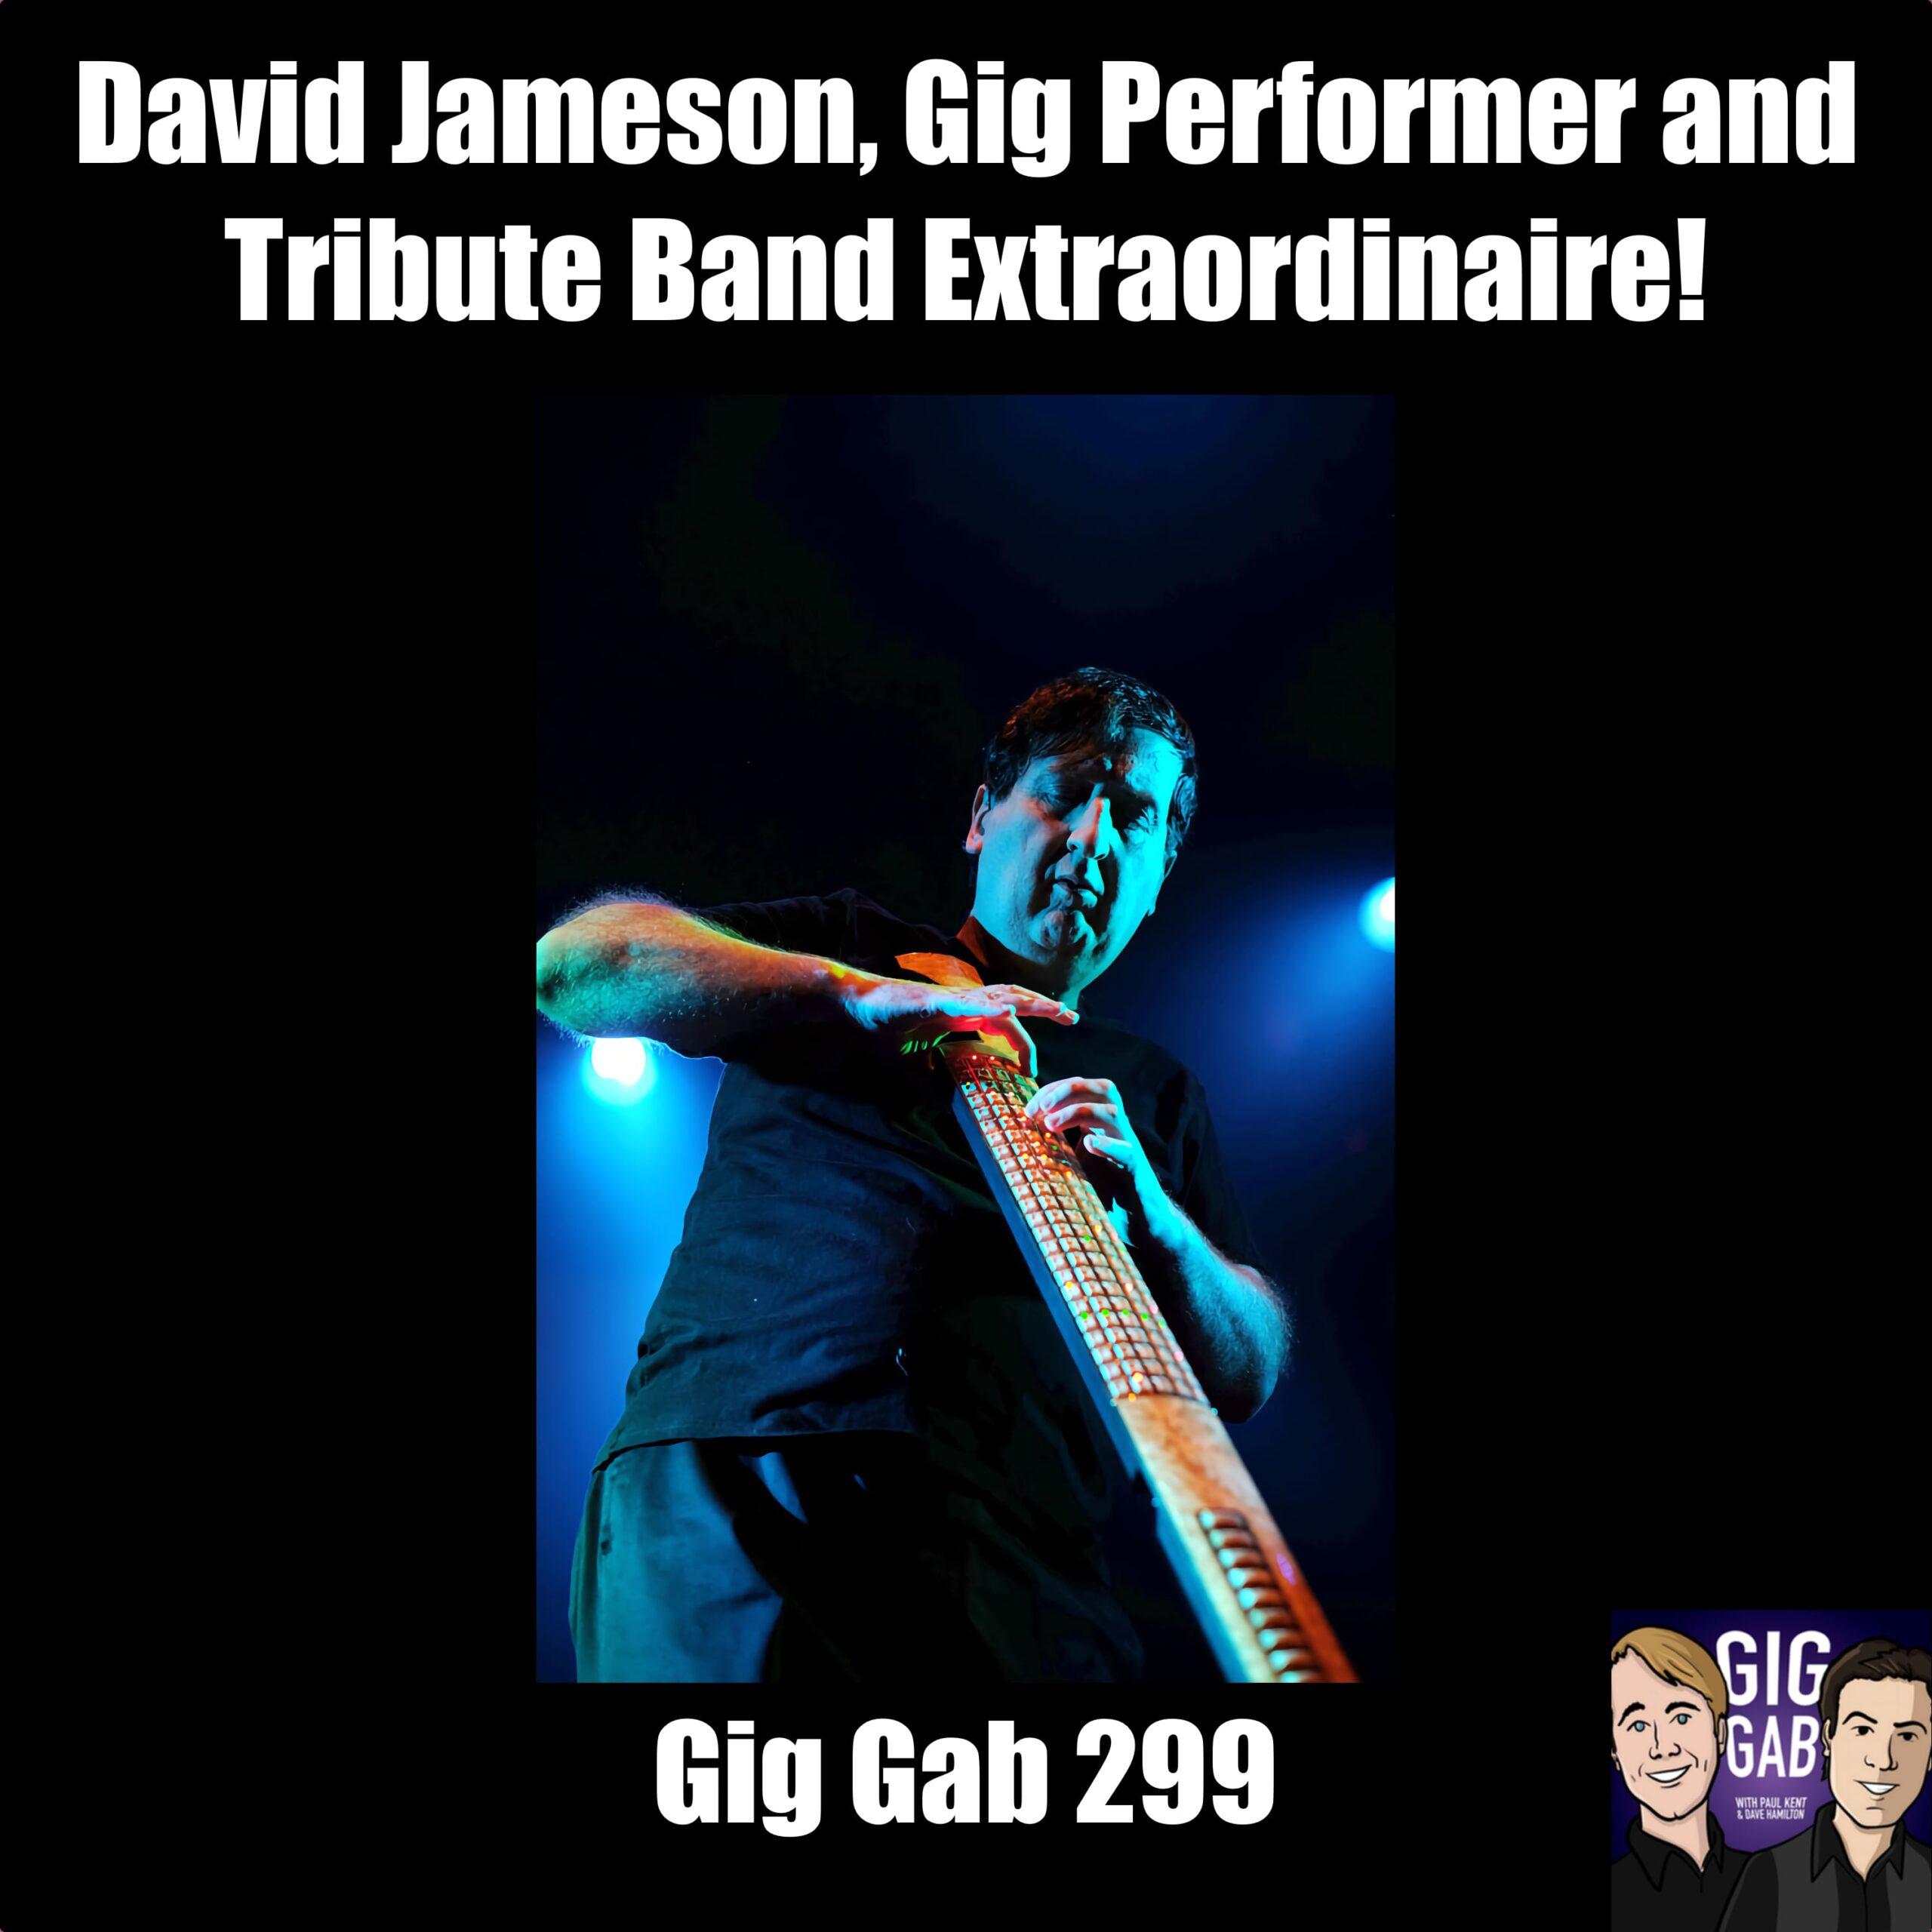 David Jameson playing the Eigenharp on the cover of Gig Gab 299